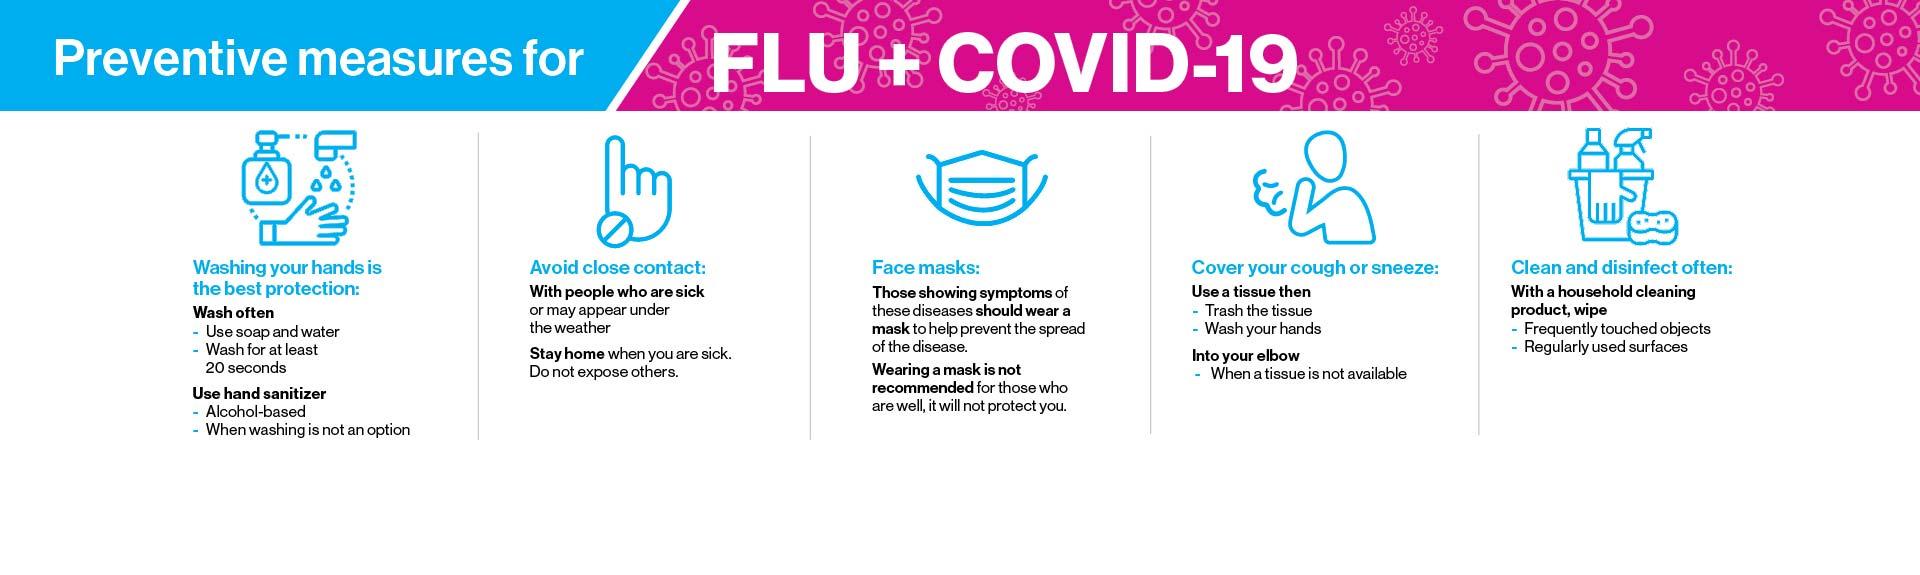 Novel Coronavirus Covid 19 Mount Sinai New York